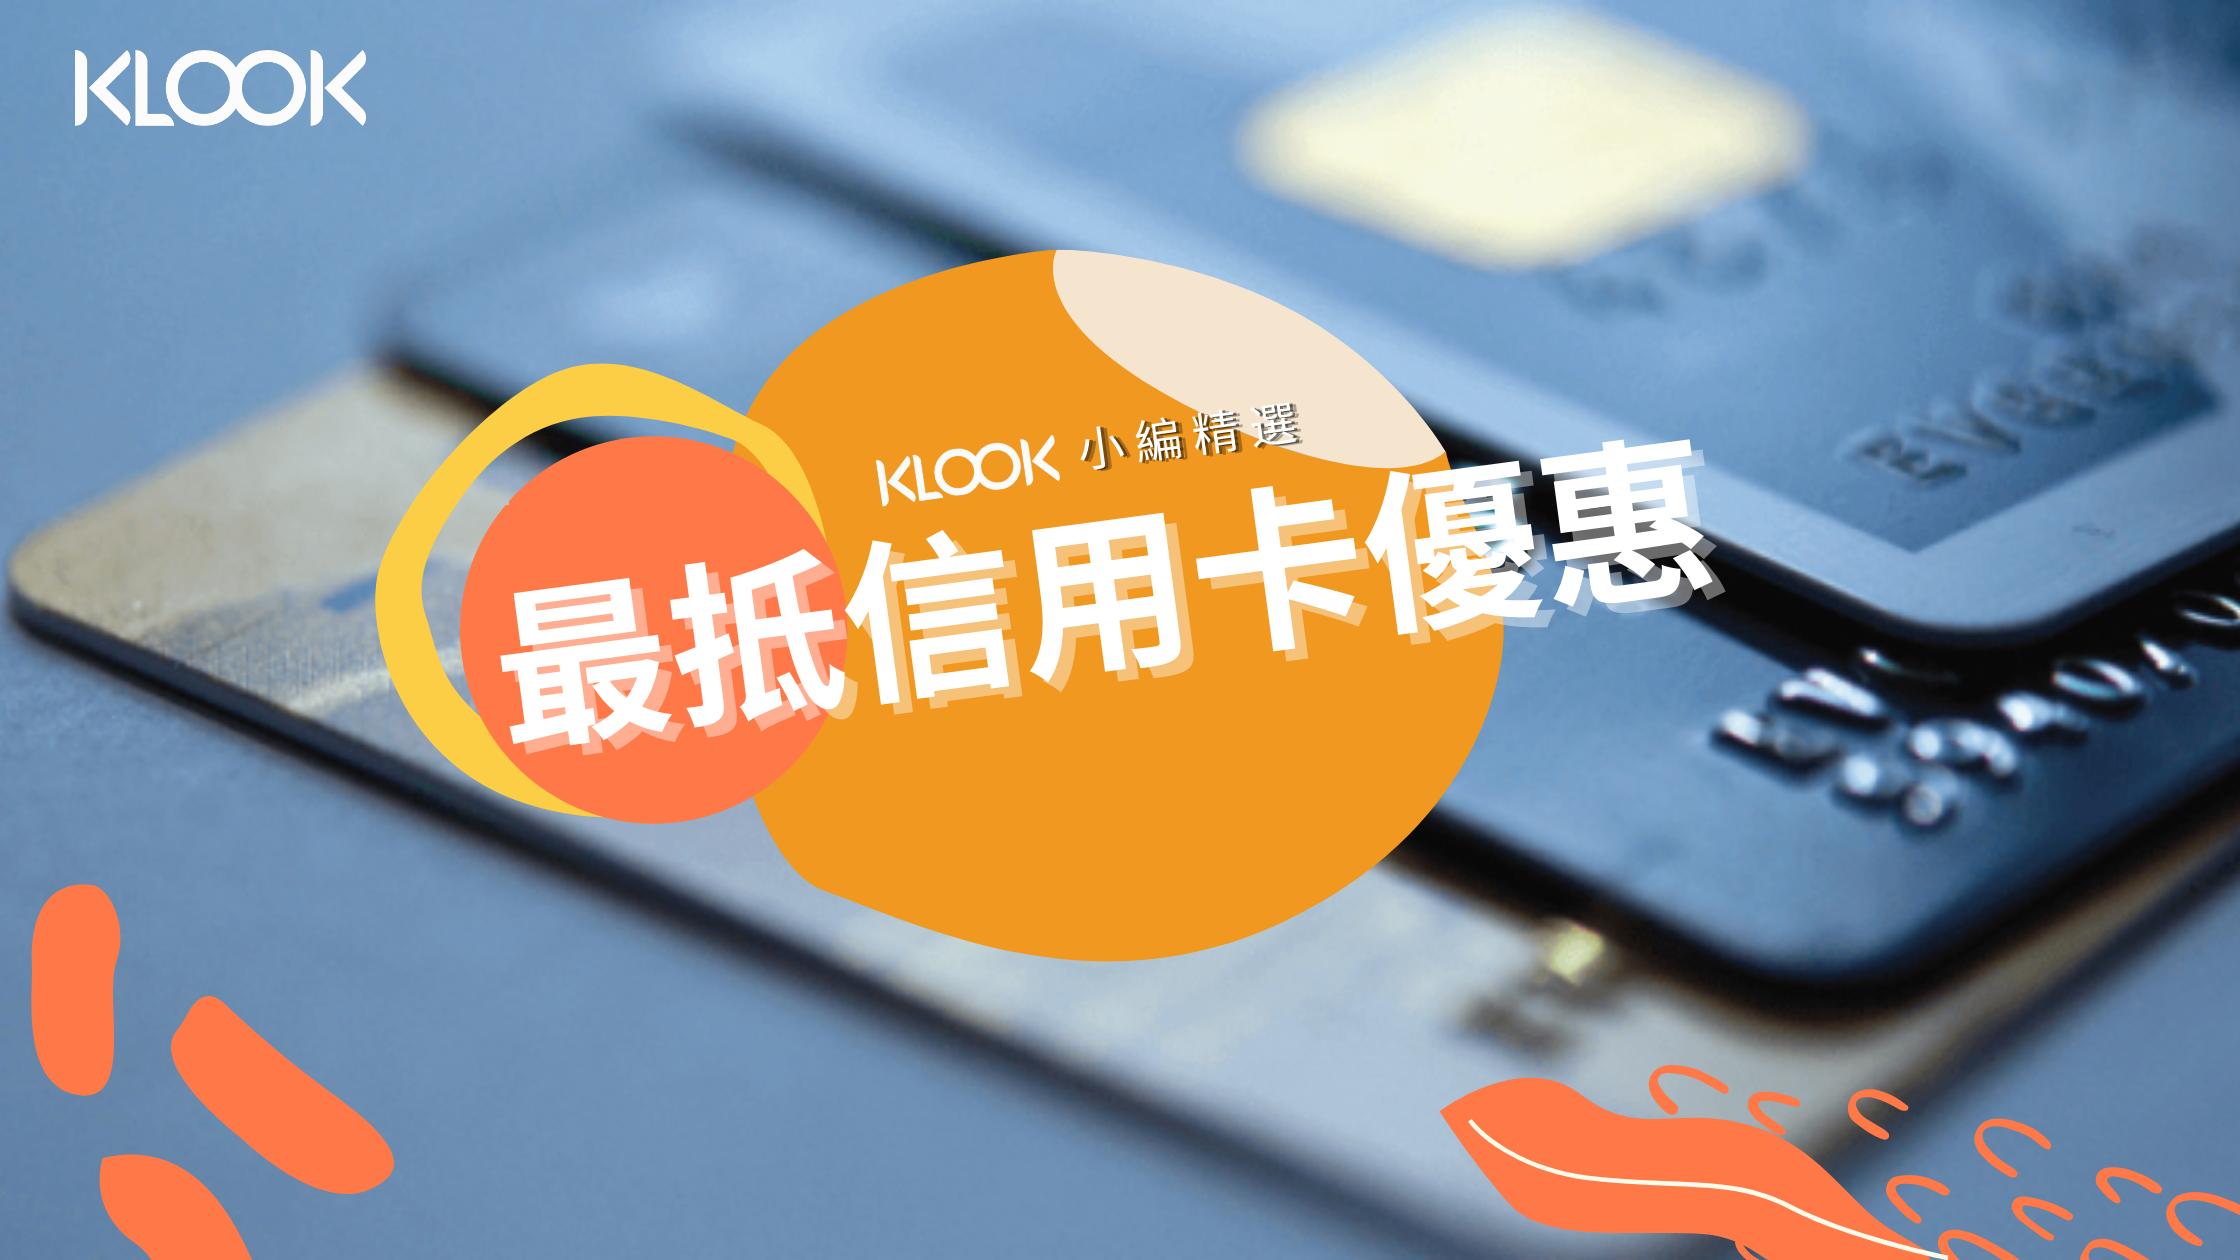 Klook小編精選信用卡優惠攻略【更新至2020/07/31】